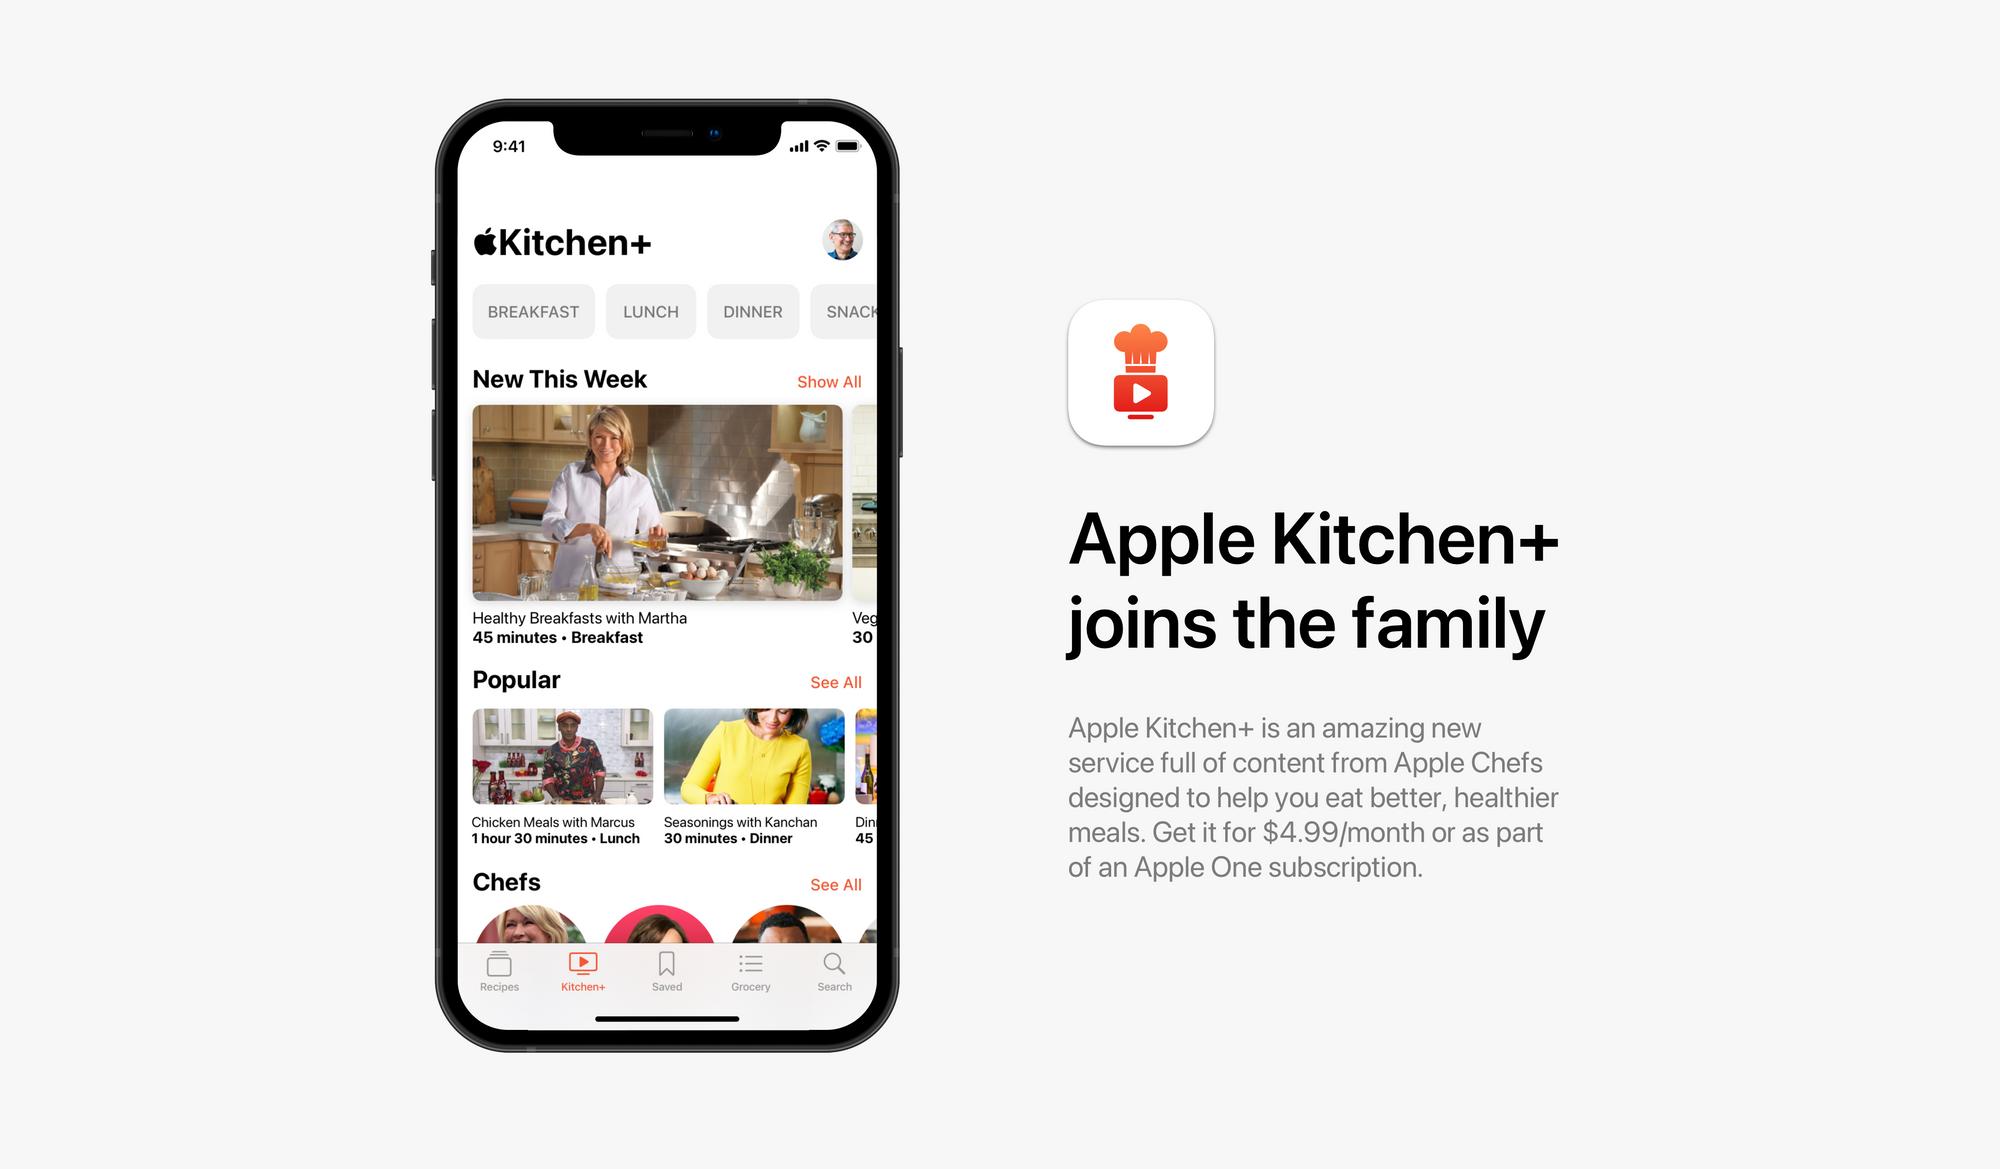 Secção de vídeos na Apple Kitchen